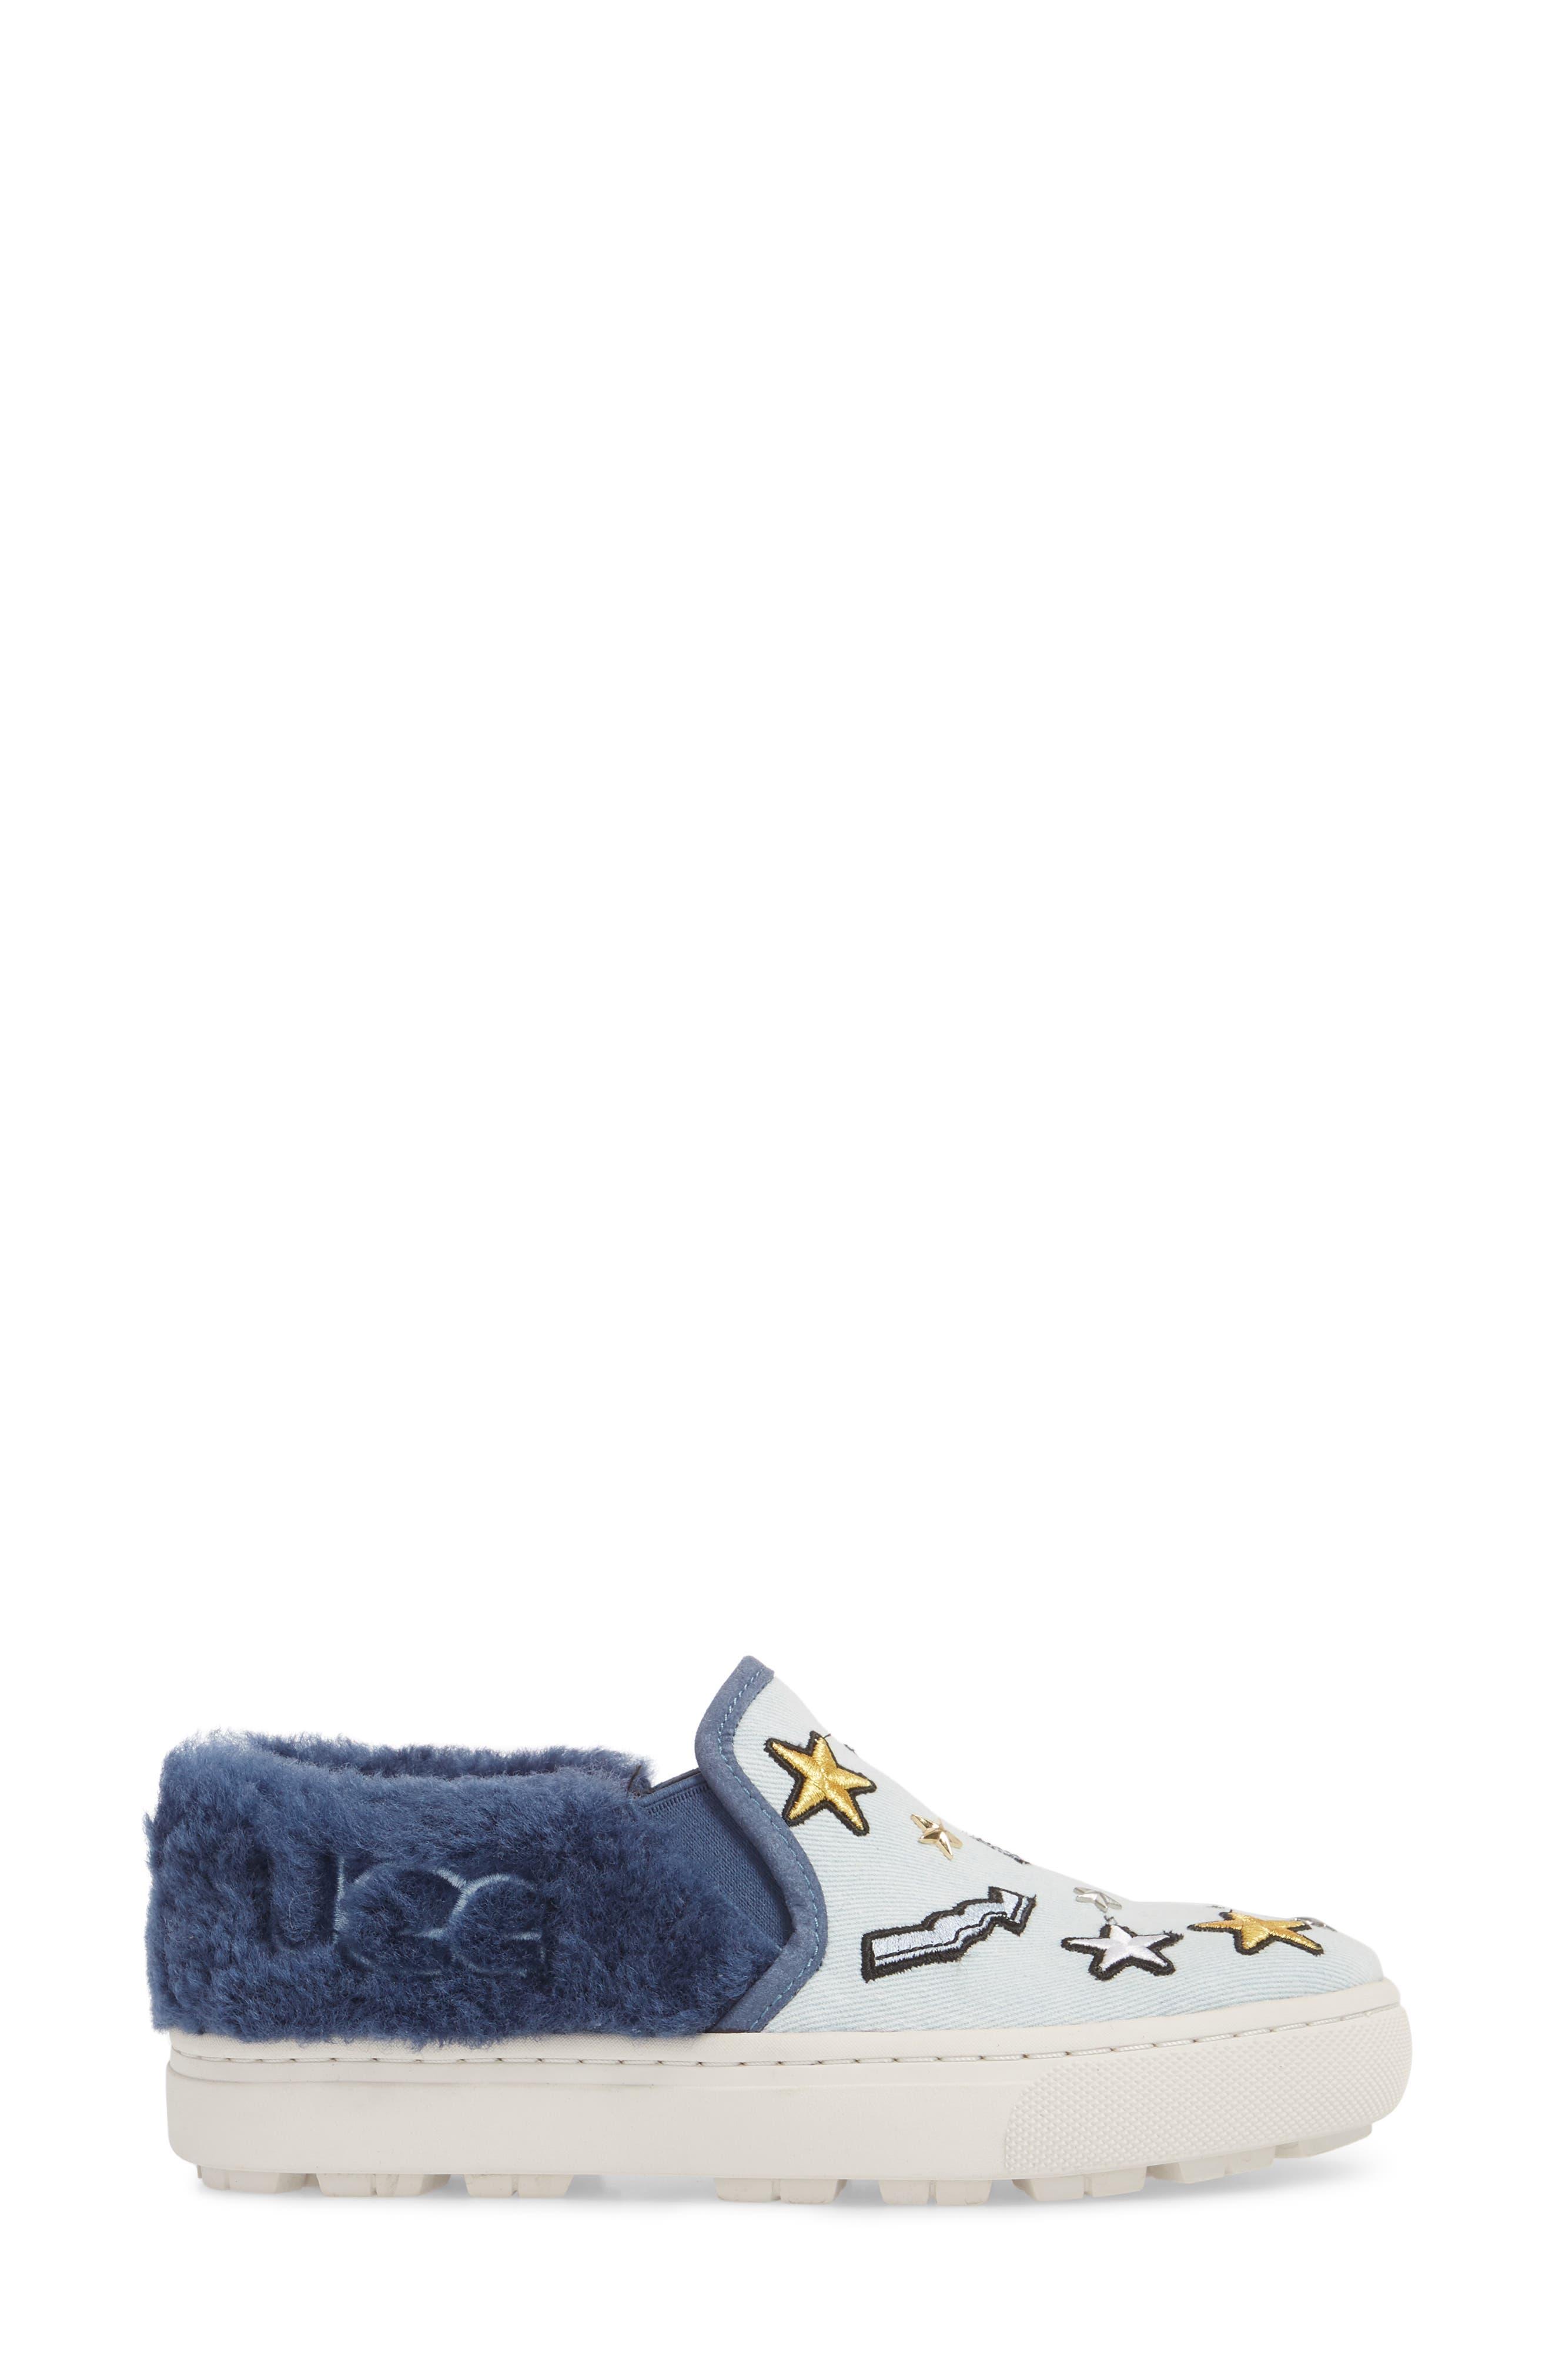 Patch It Genuine Shearling Trim Slip-On Sneaker,                             Alternate thumbnail 3, color,                             BLEACH DENIM